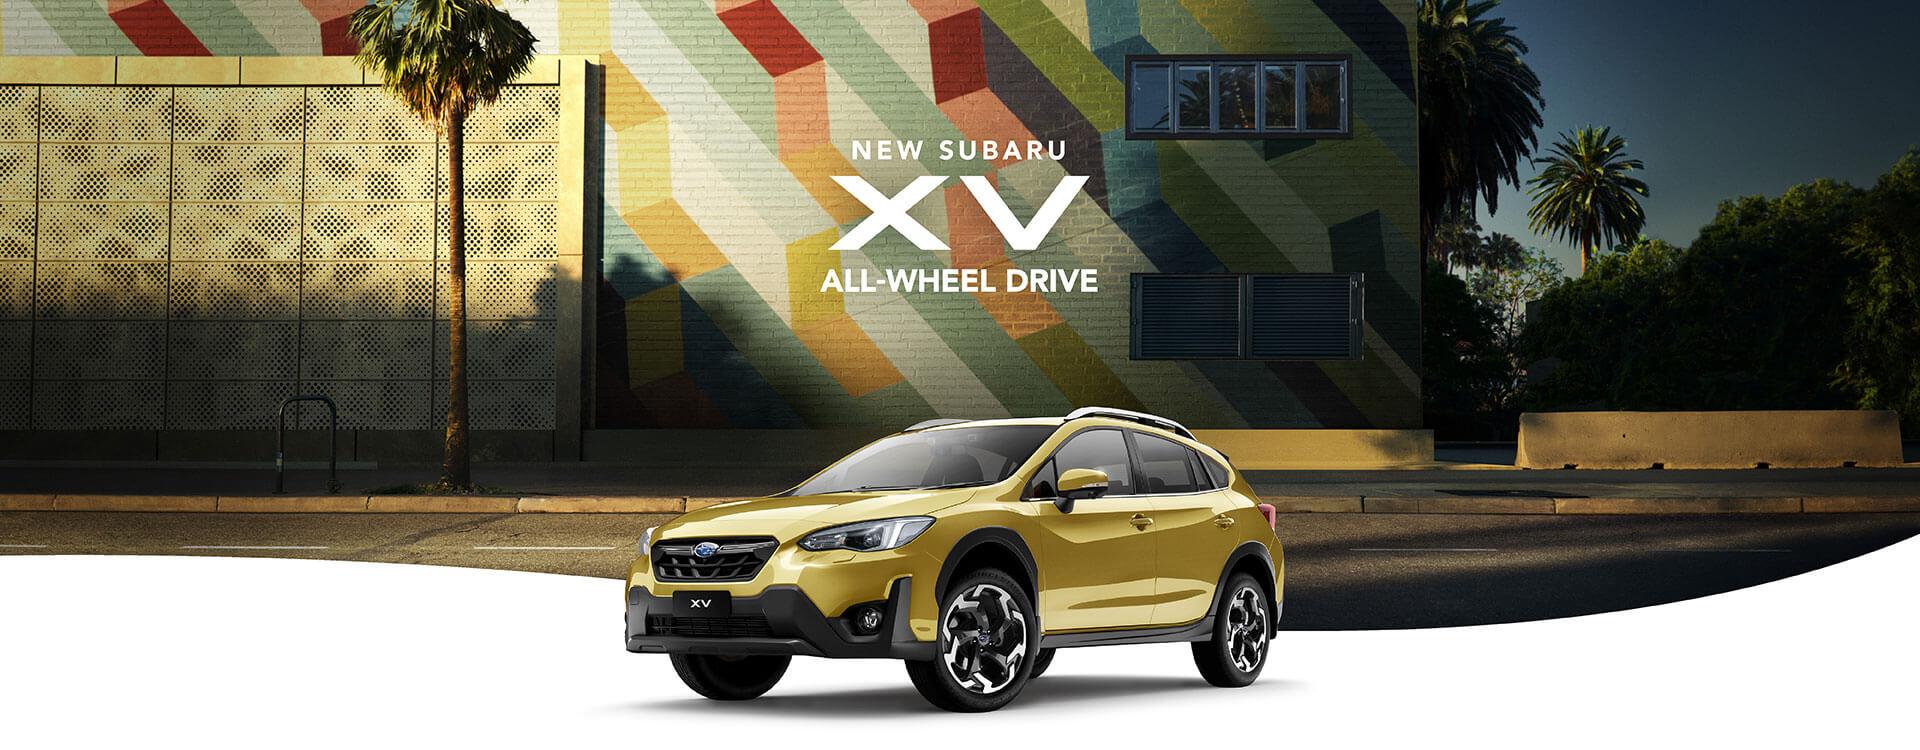 New Subaru XV Image